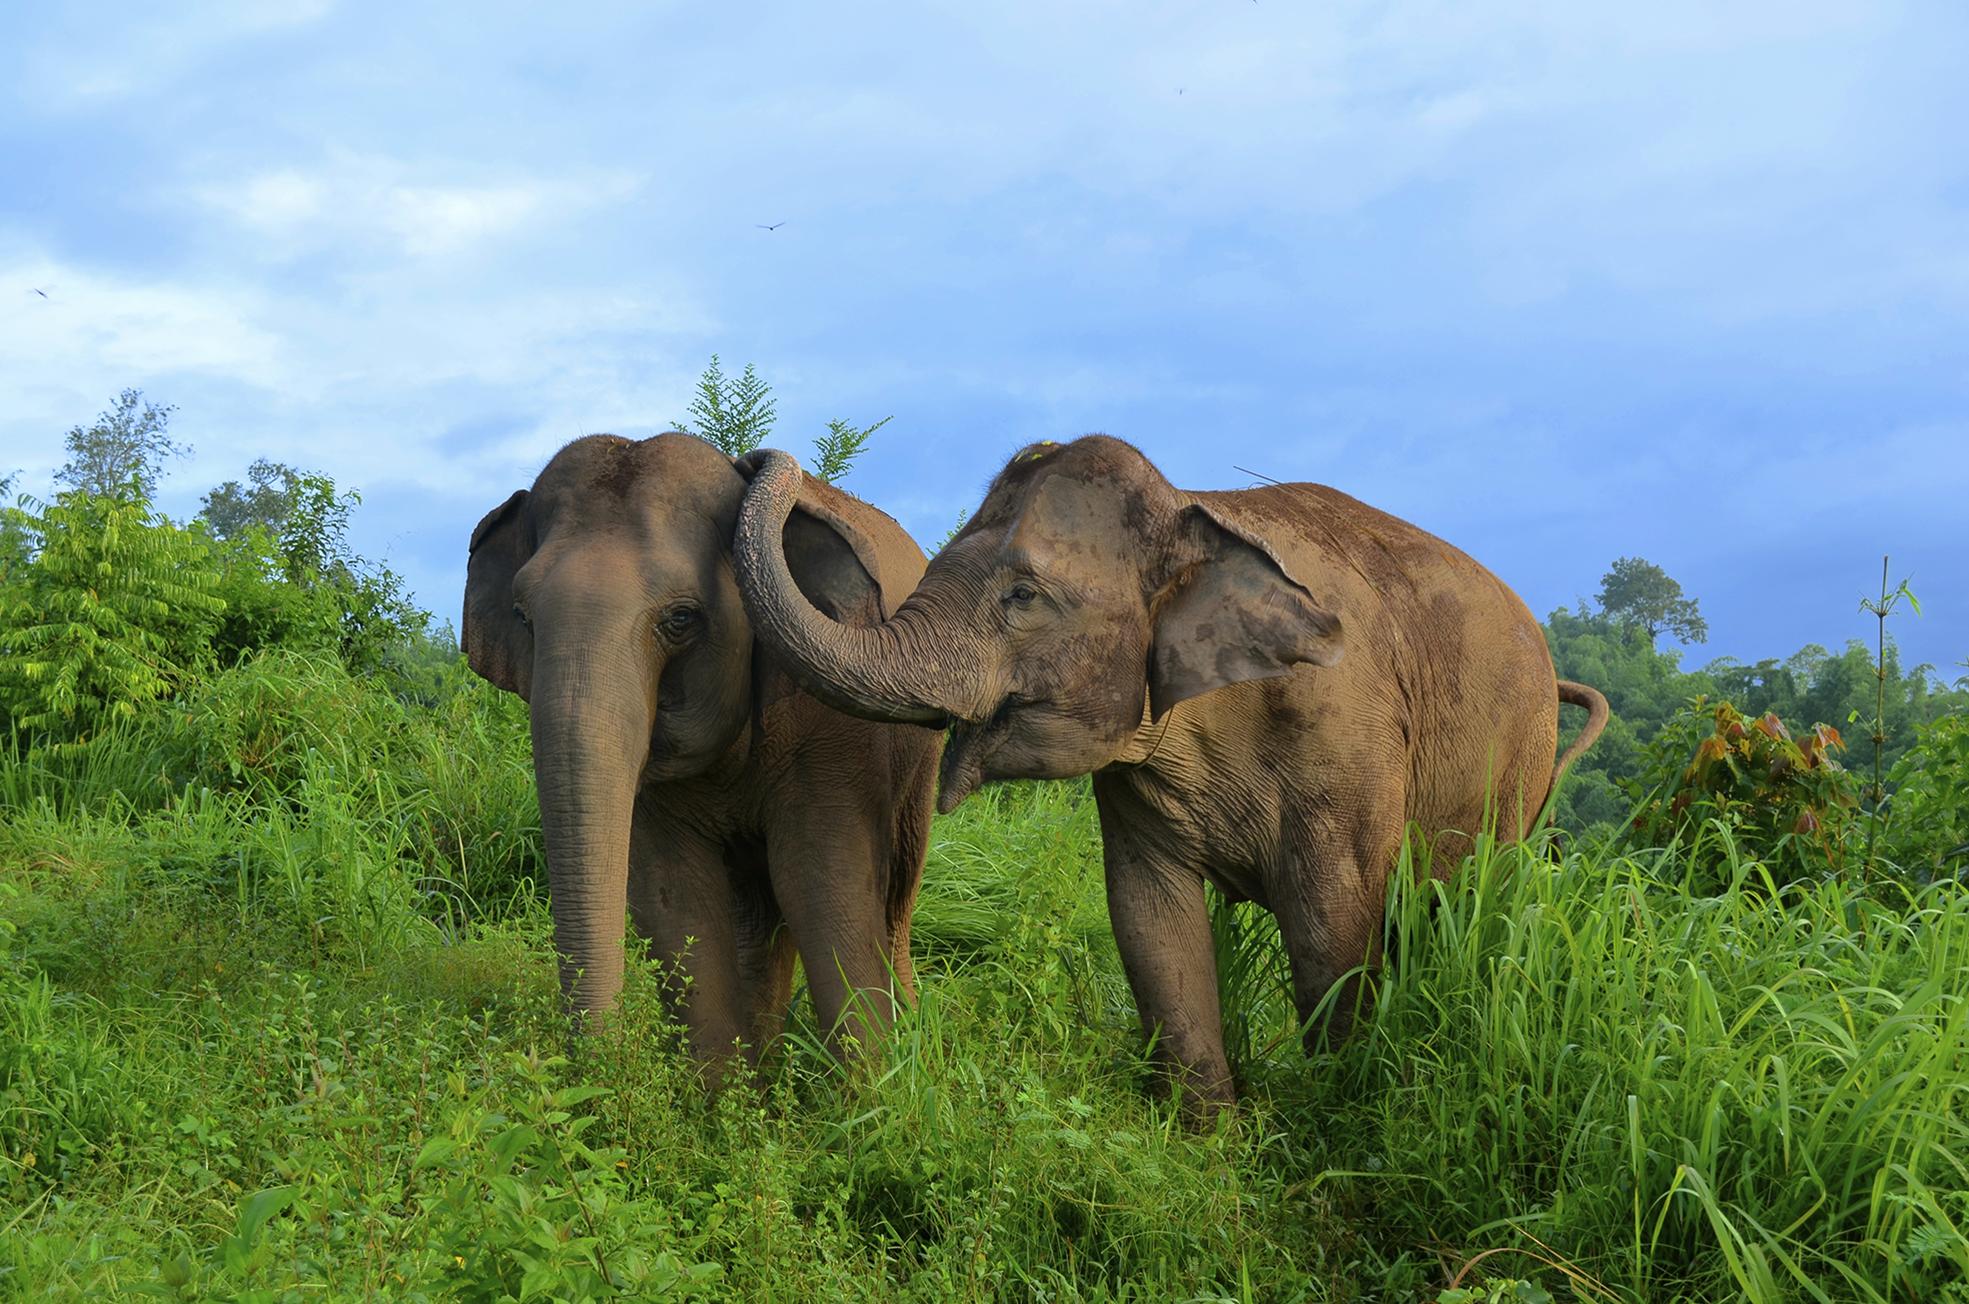 asian elephants elephas maximus reassure others in distress peerj